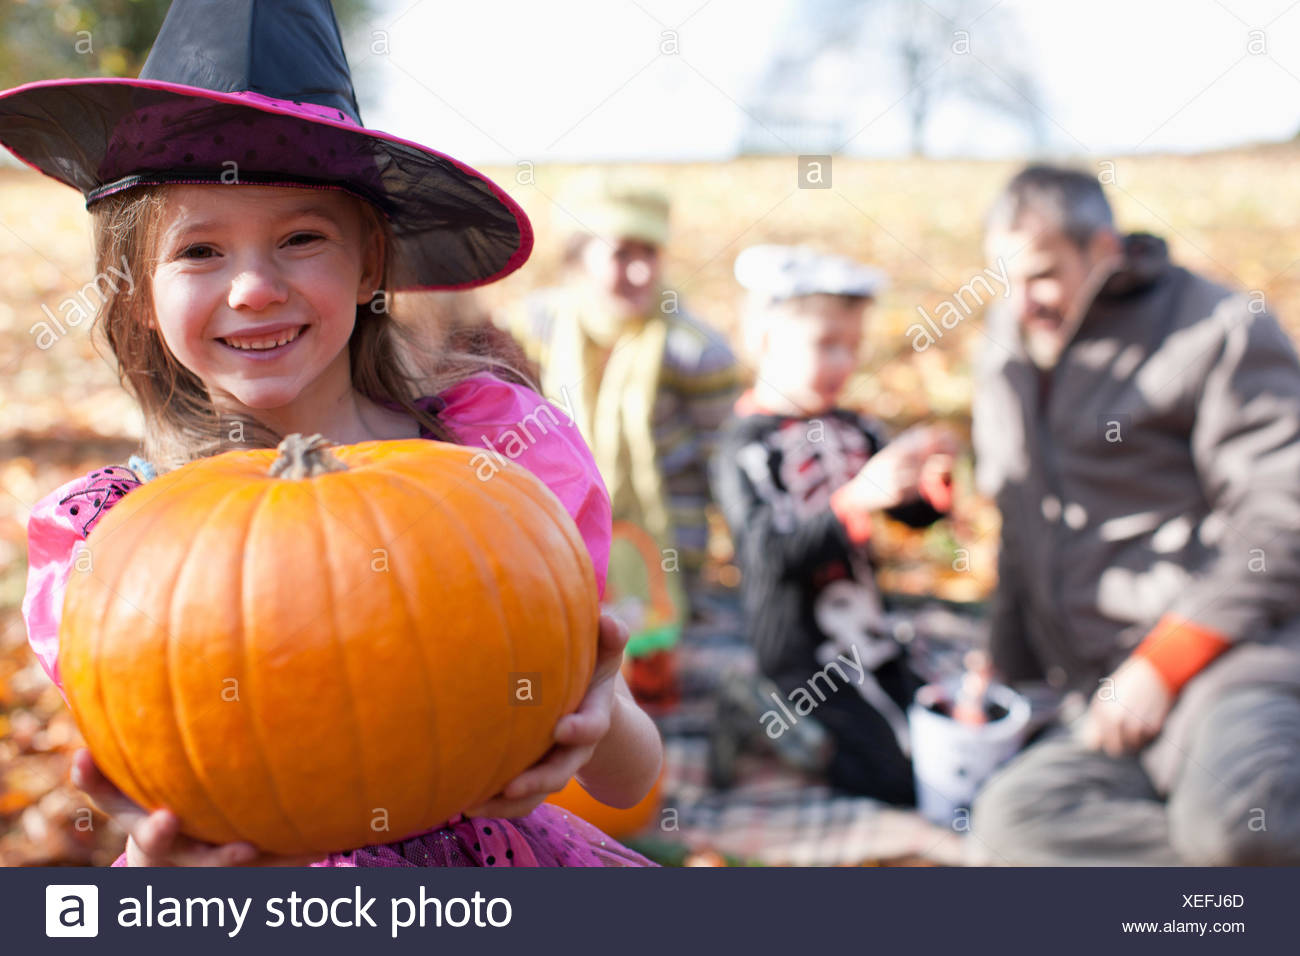 Mädchen in Halloween-Kostümen mit Kürbis Stockbild